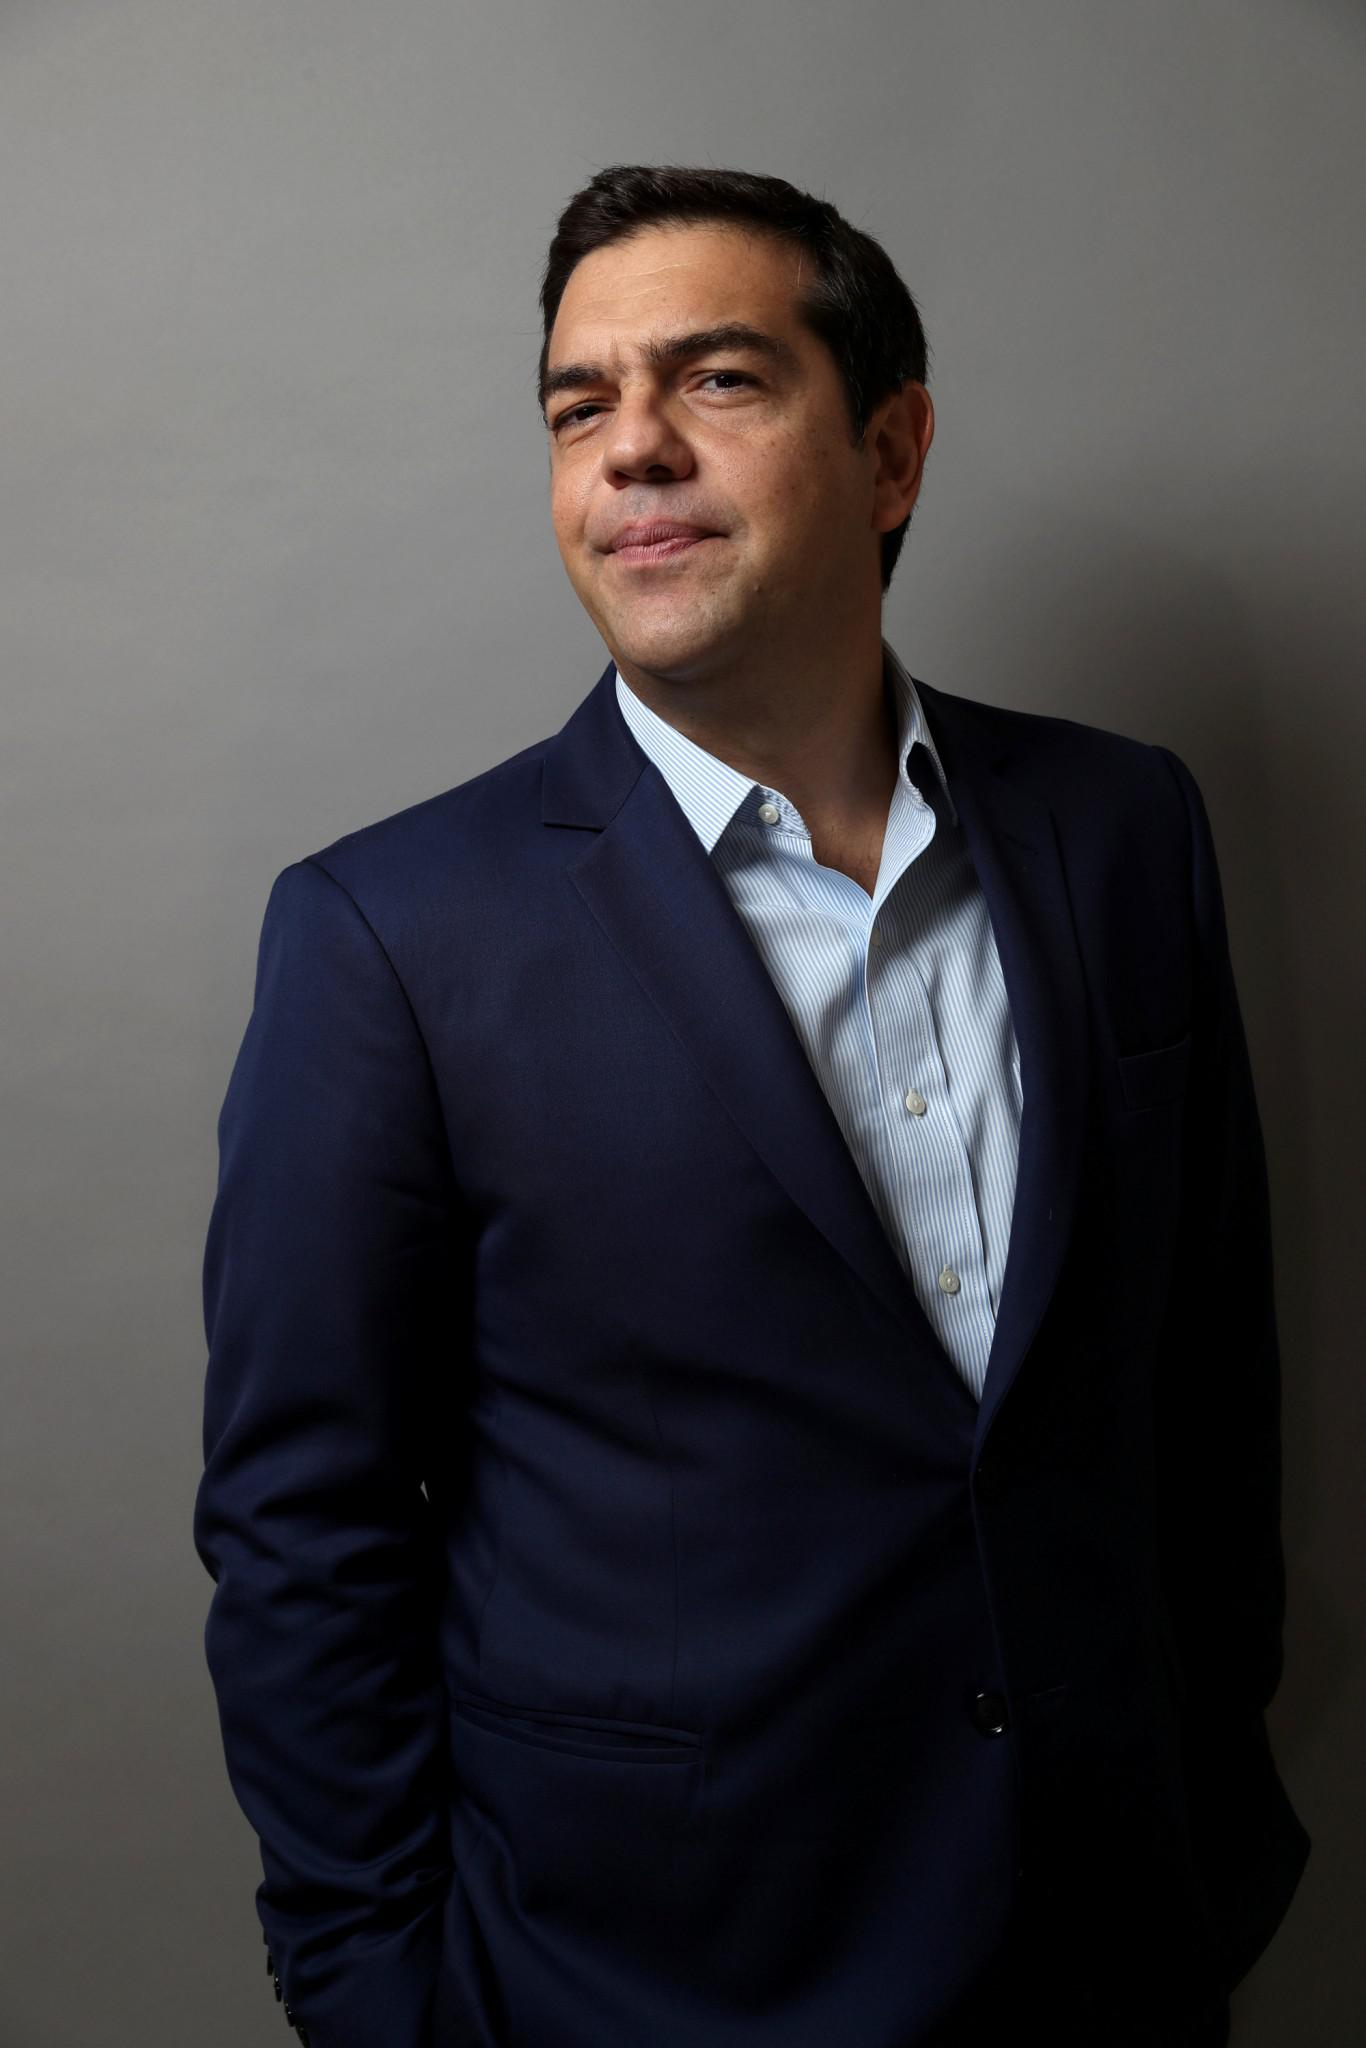 tsipras-reuters-1300